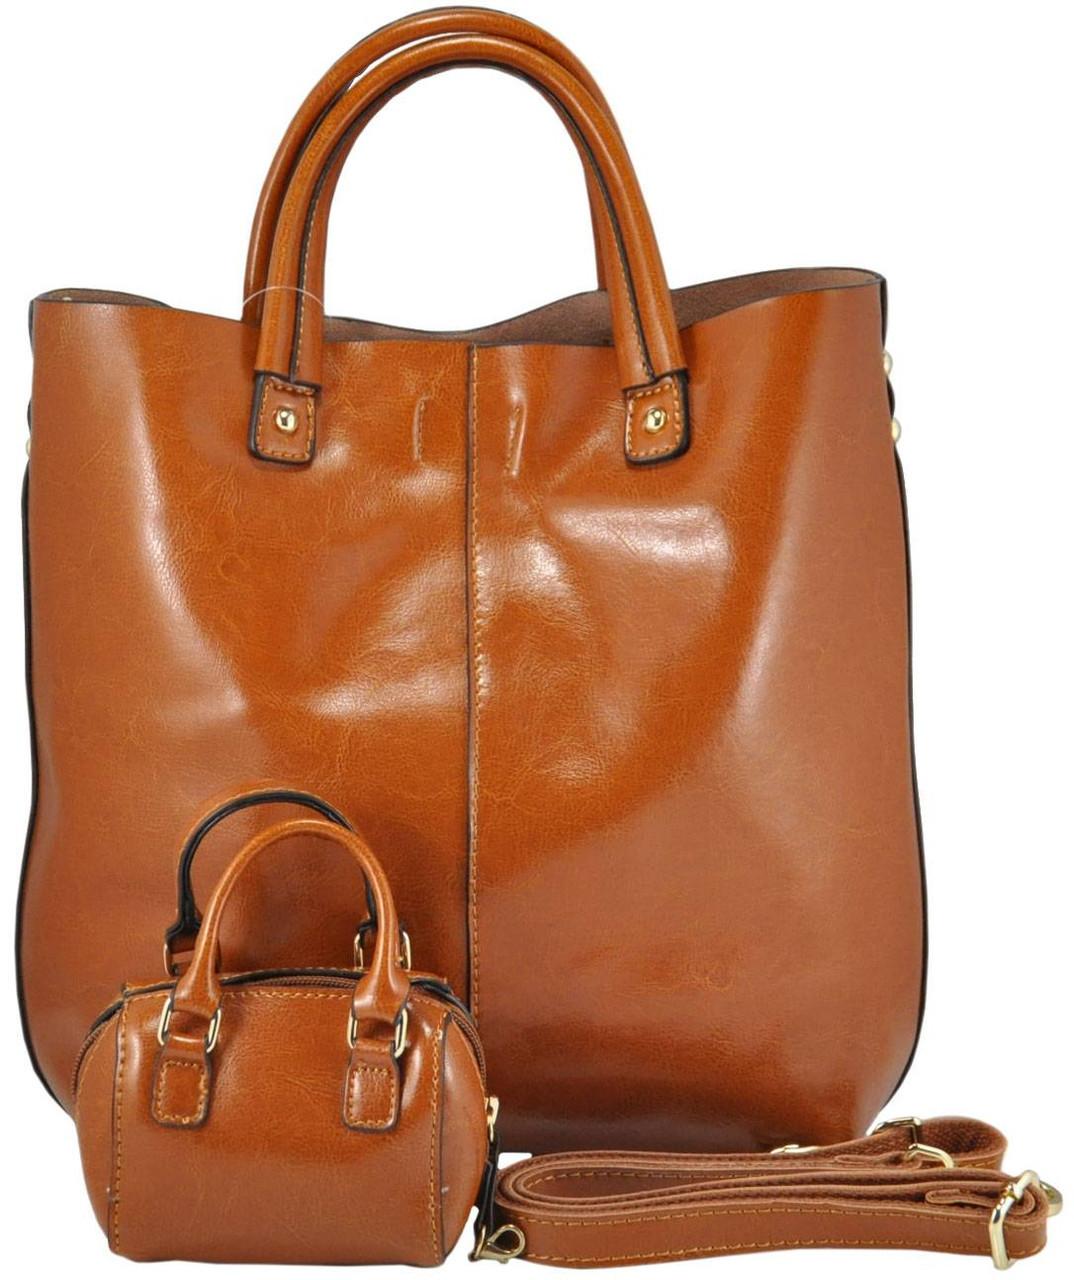 Женская кожаная сумка 8010 рыжая